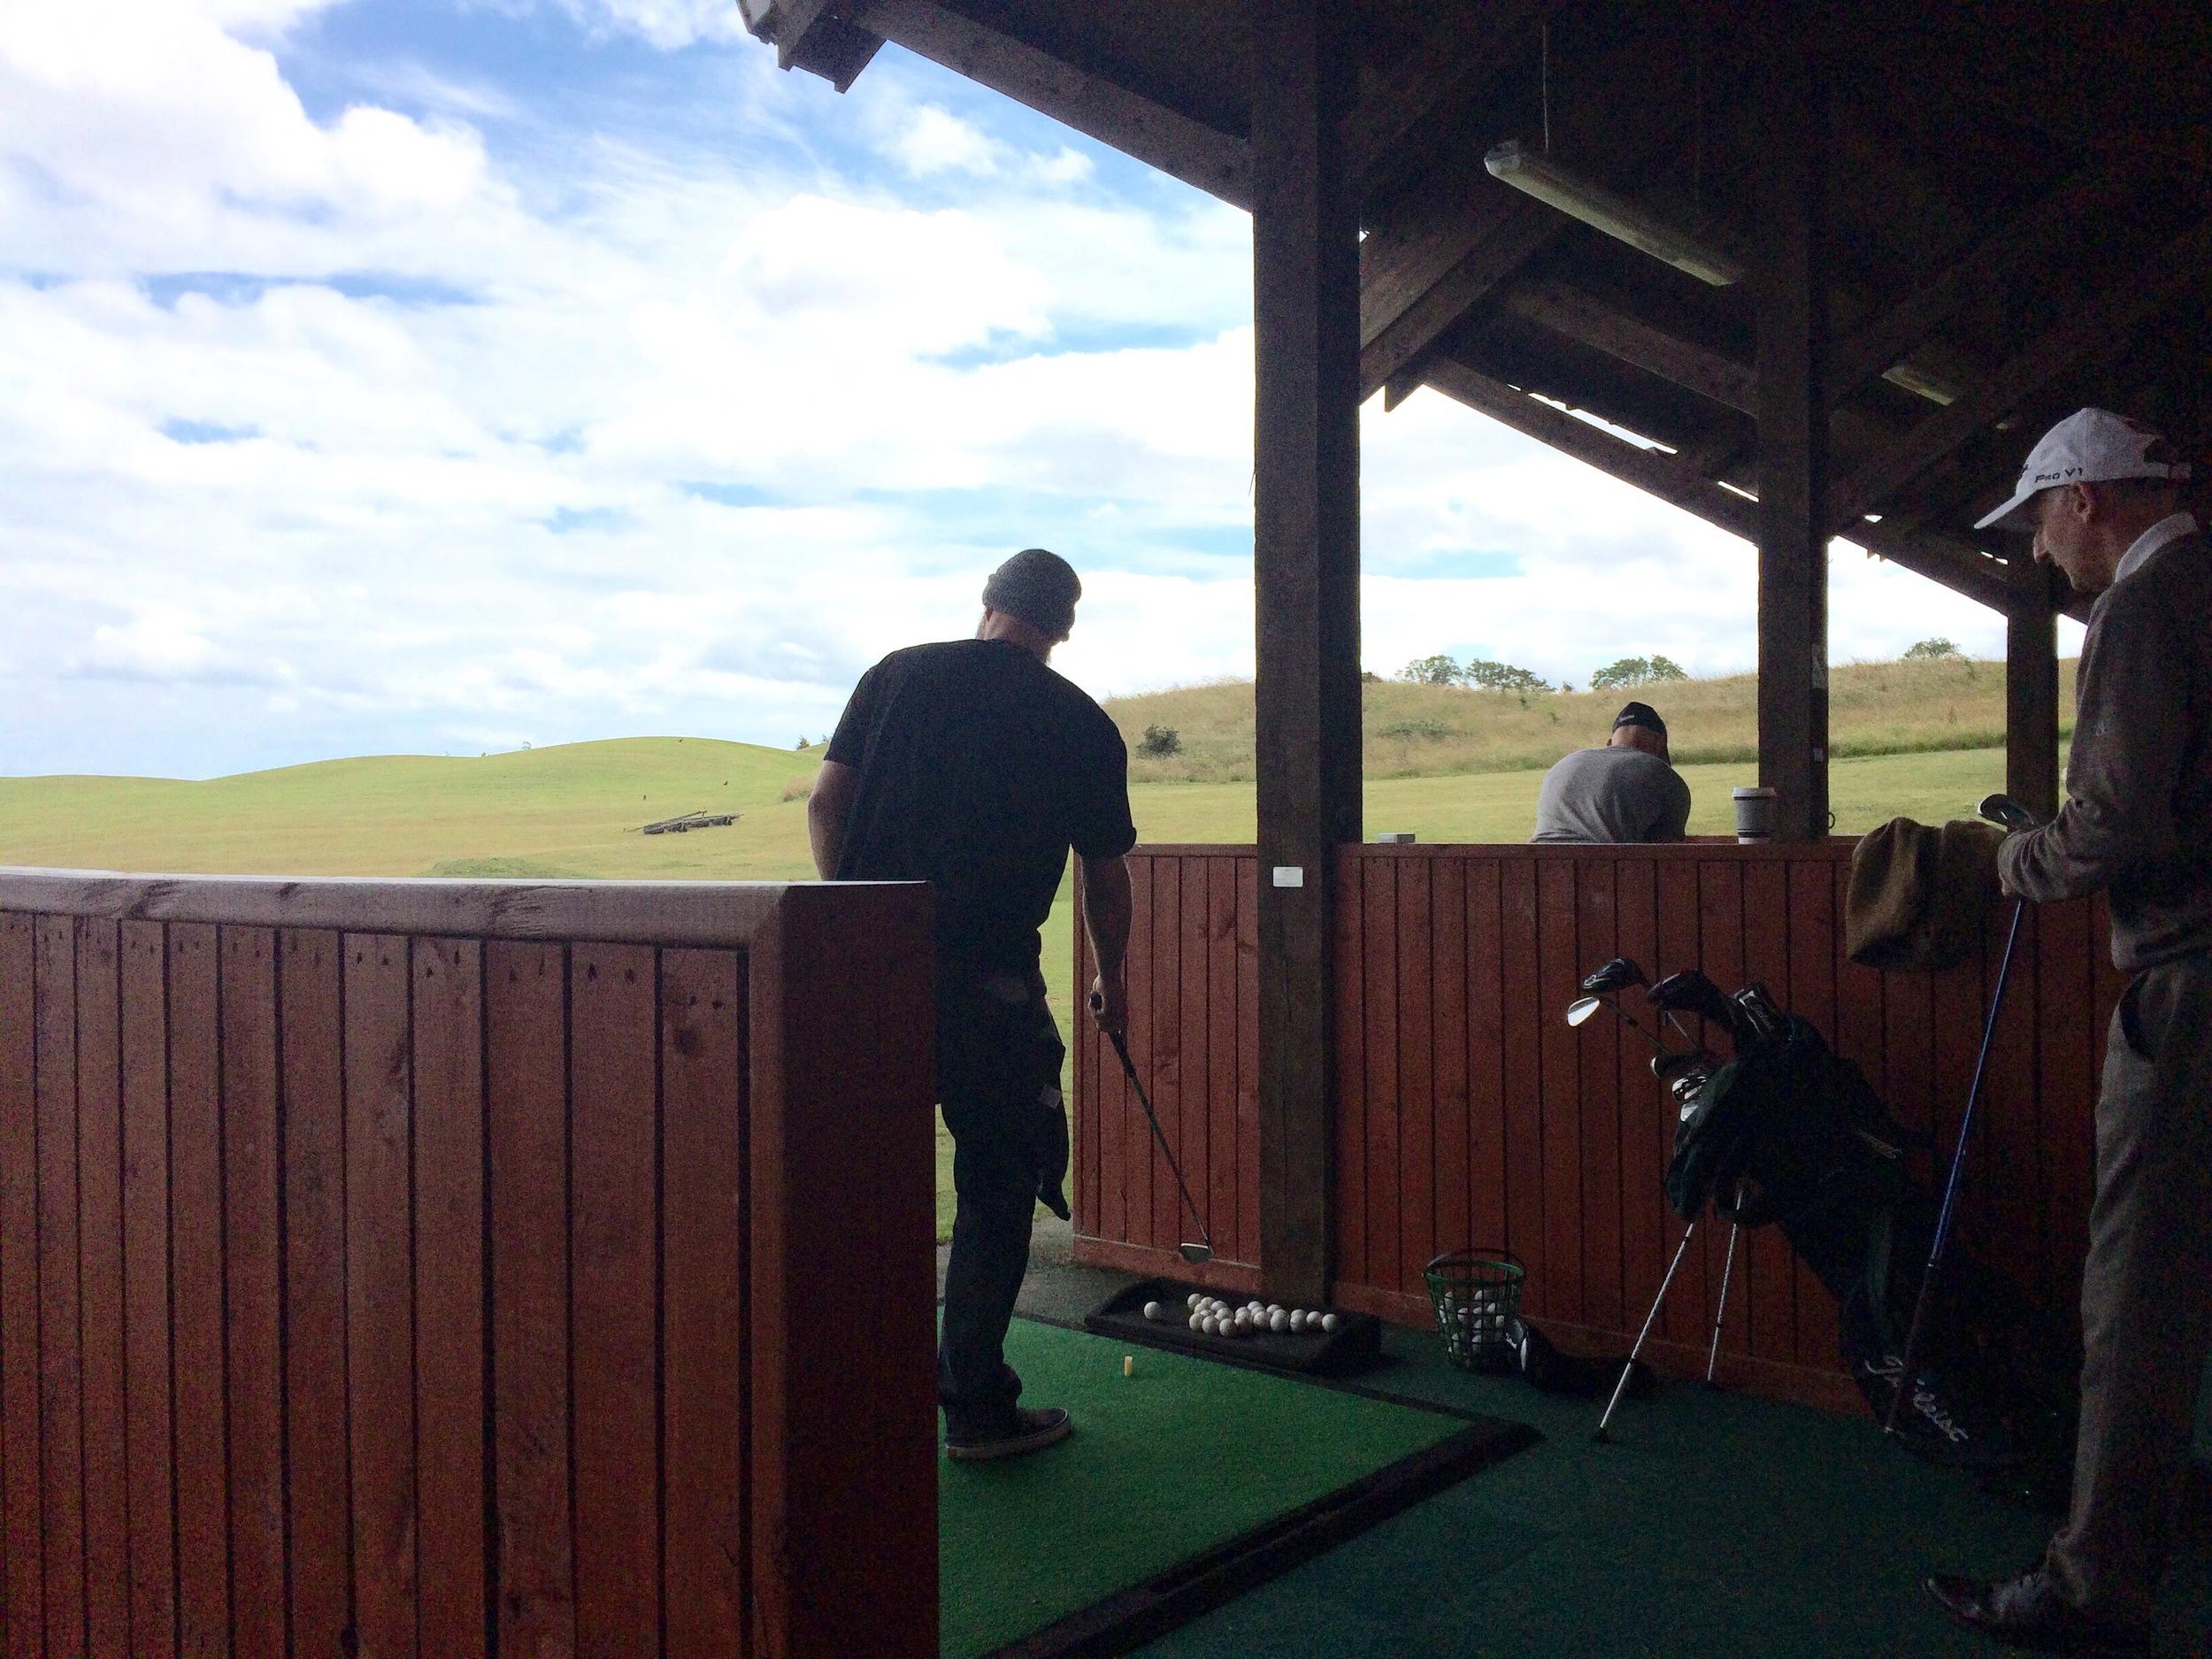 ◆ Golf lessons